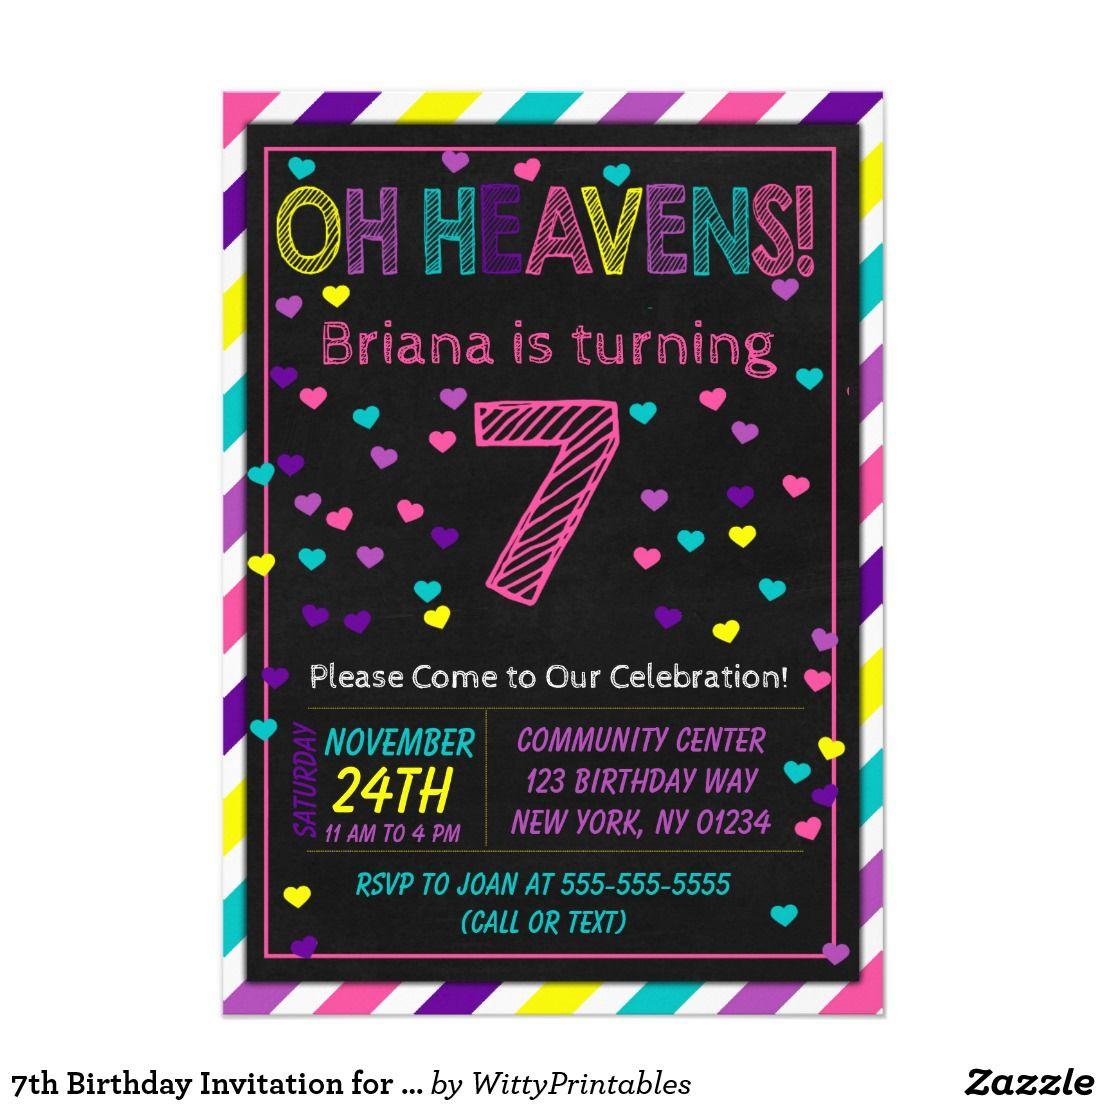 7th birthday invitation for a girls